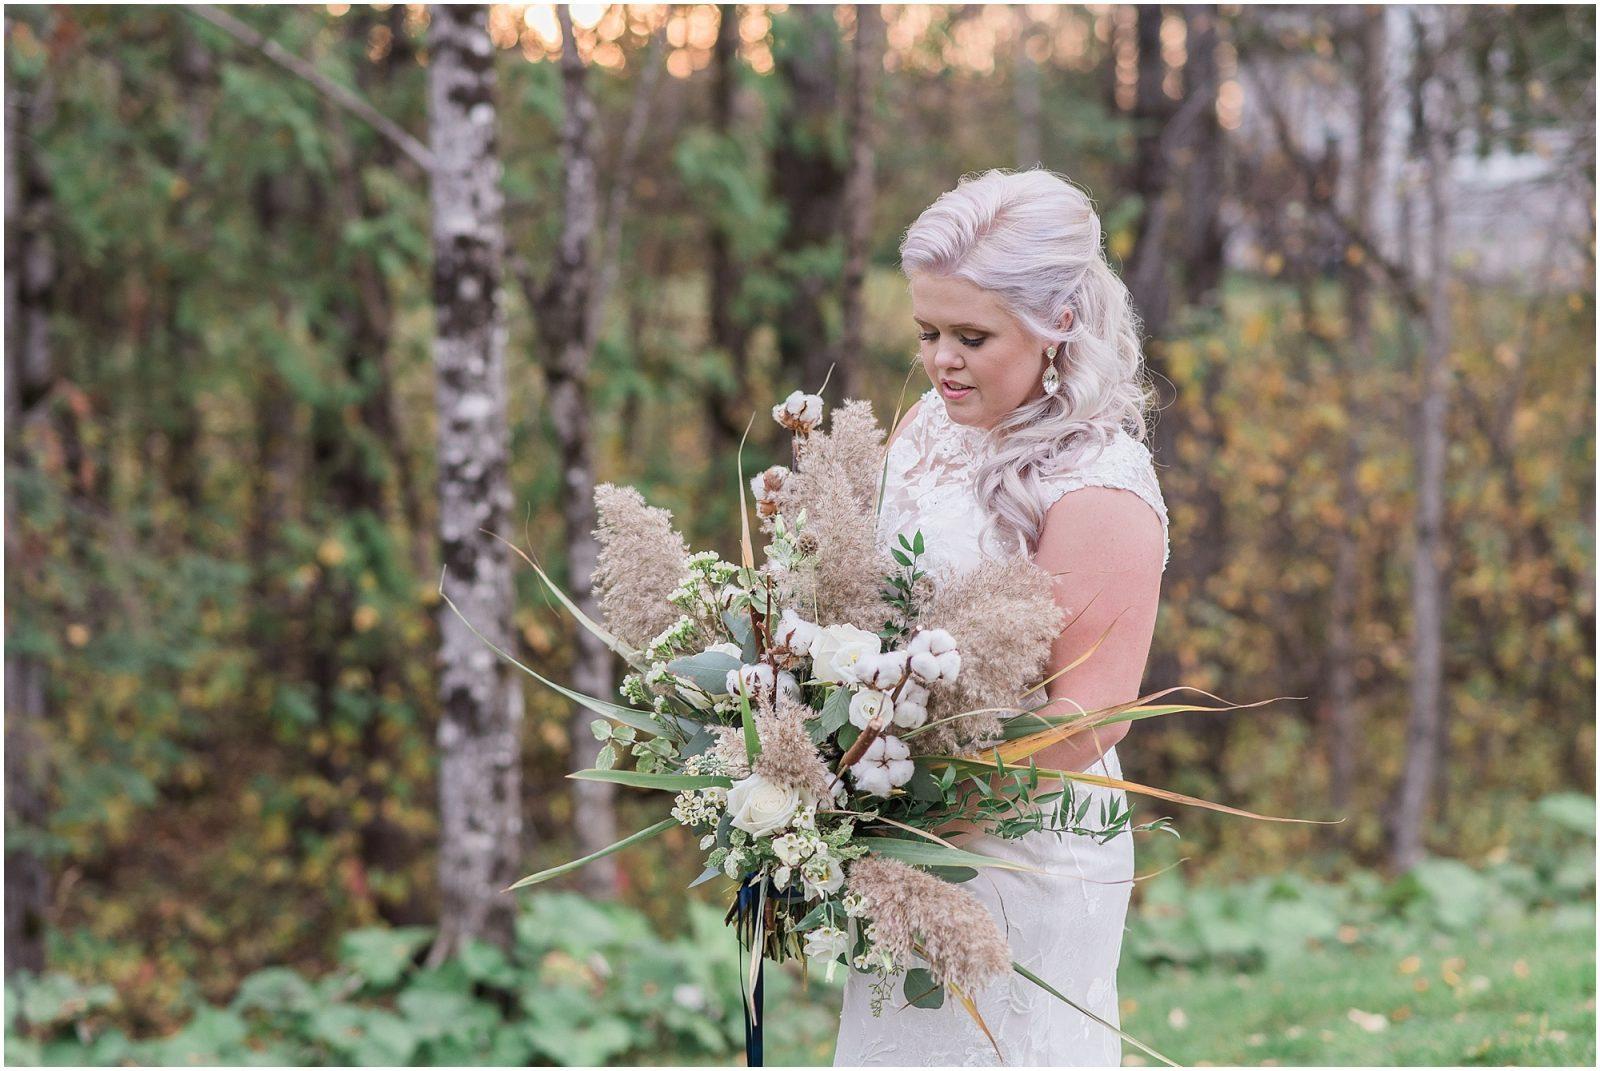 0047 Bethany and Luc - Fall Backyard Ottawa Wedding - Copper and Navy - PhotosbyEmmaH.jpg